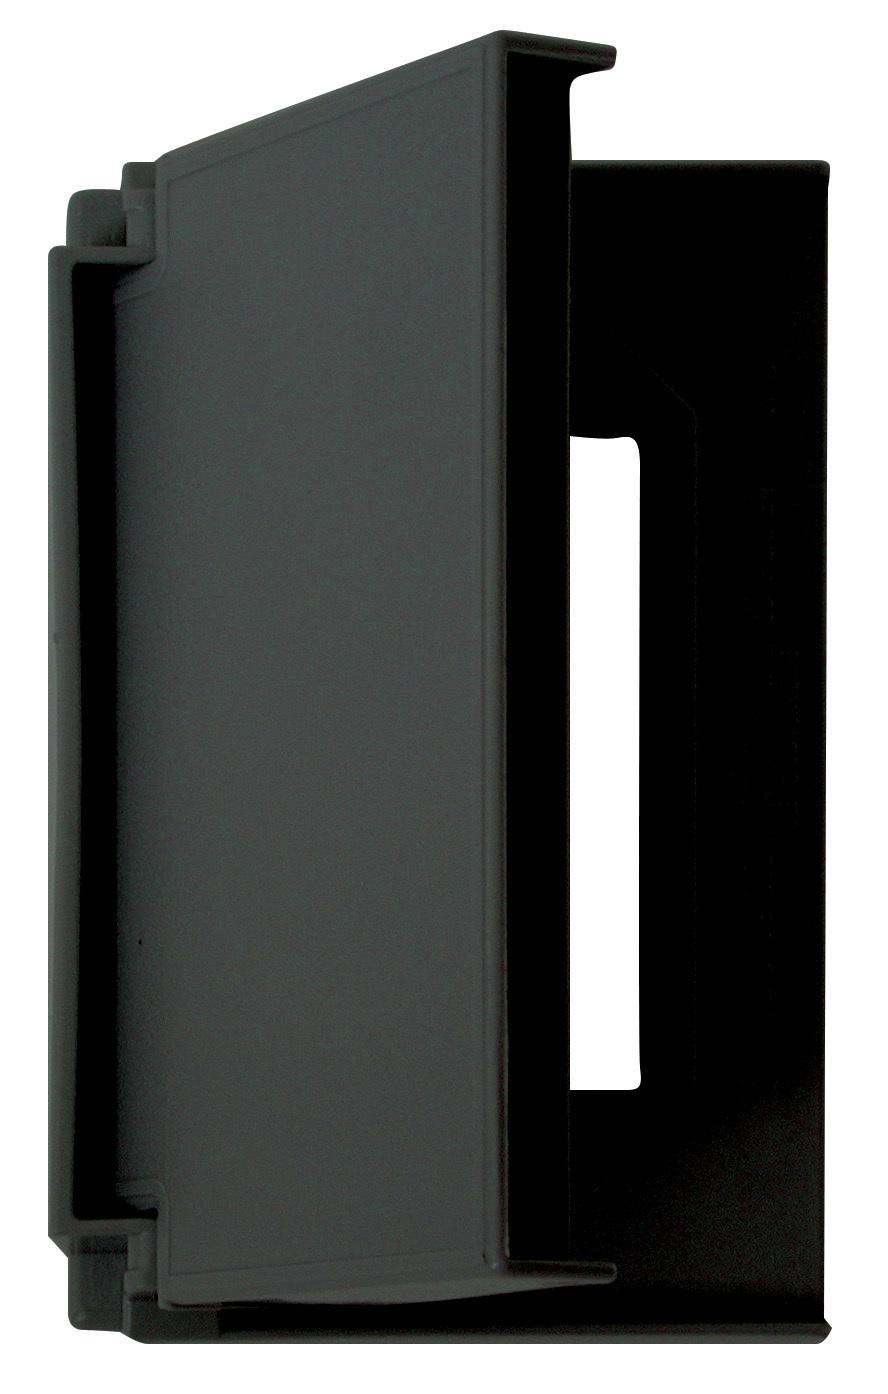 Weatherproof Decor Cover - Black 52519